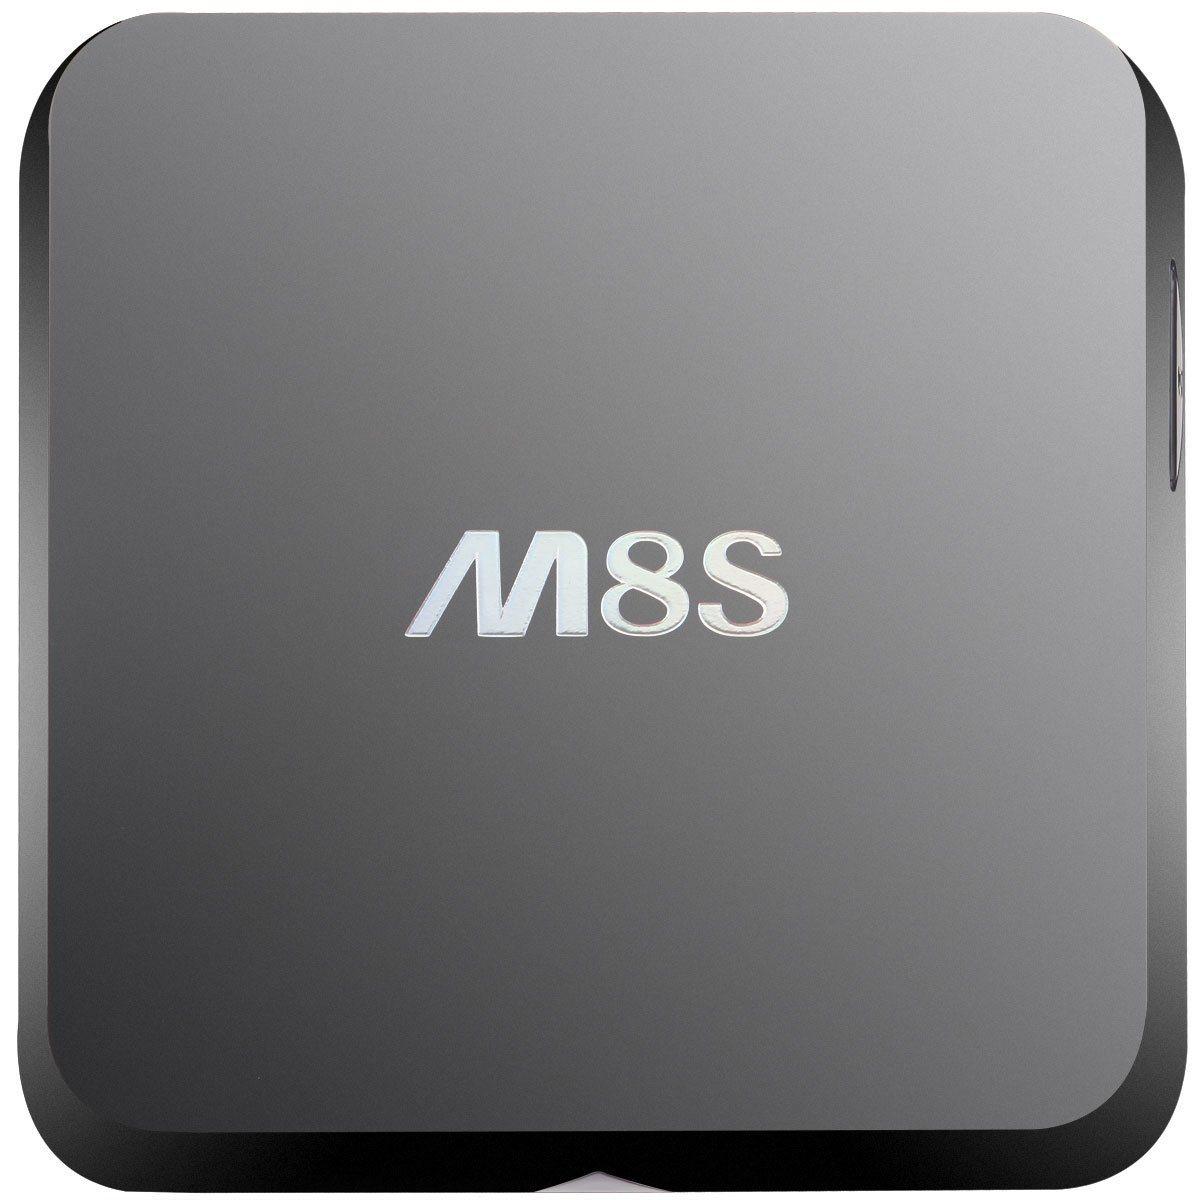 China Factory Wholesale M8s Mini PC Android TV Box Digital Set Top Box